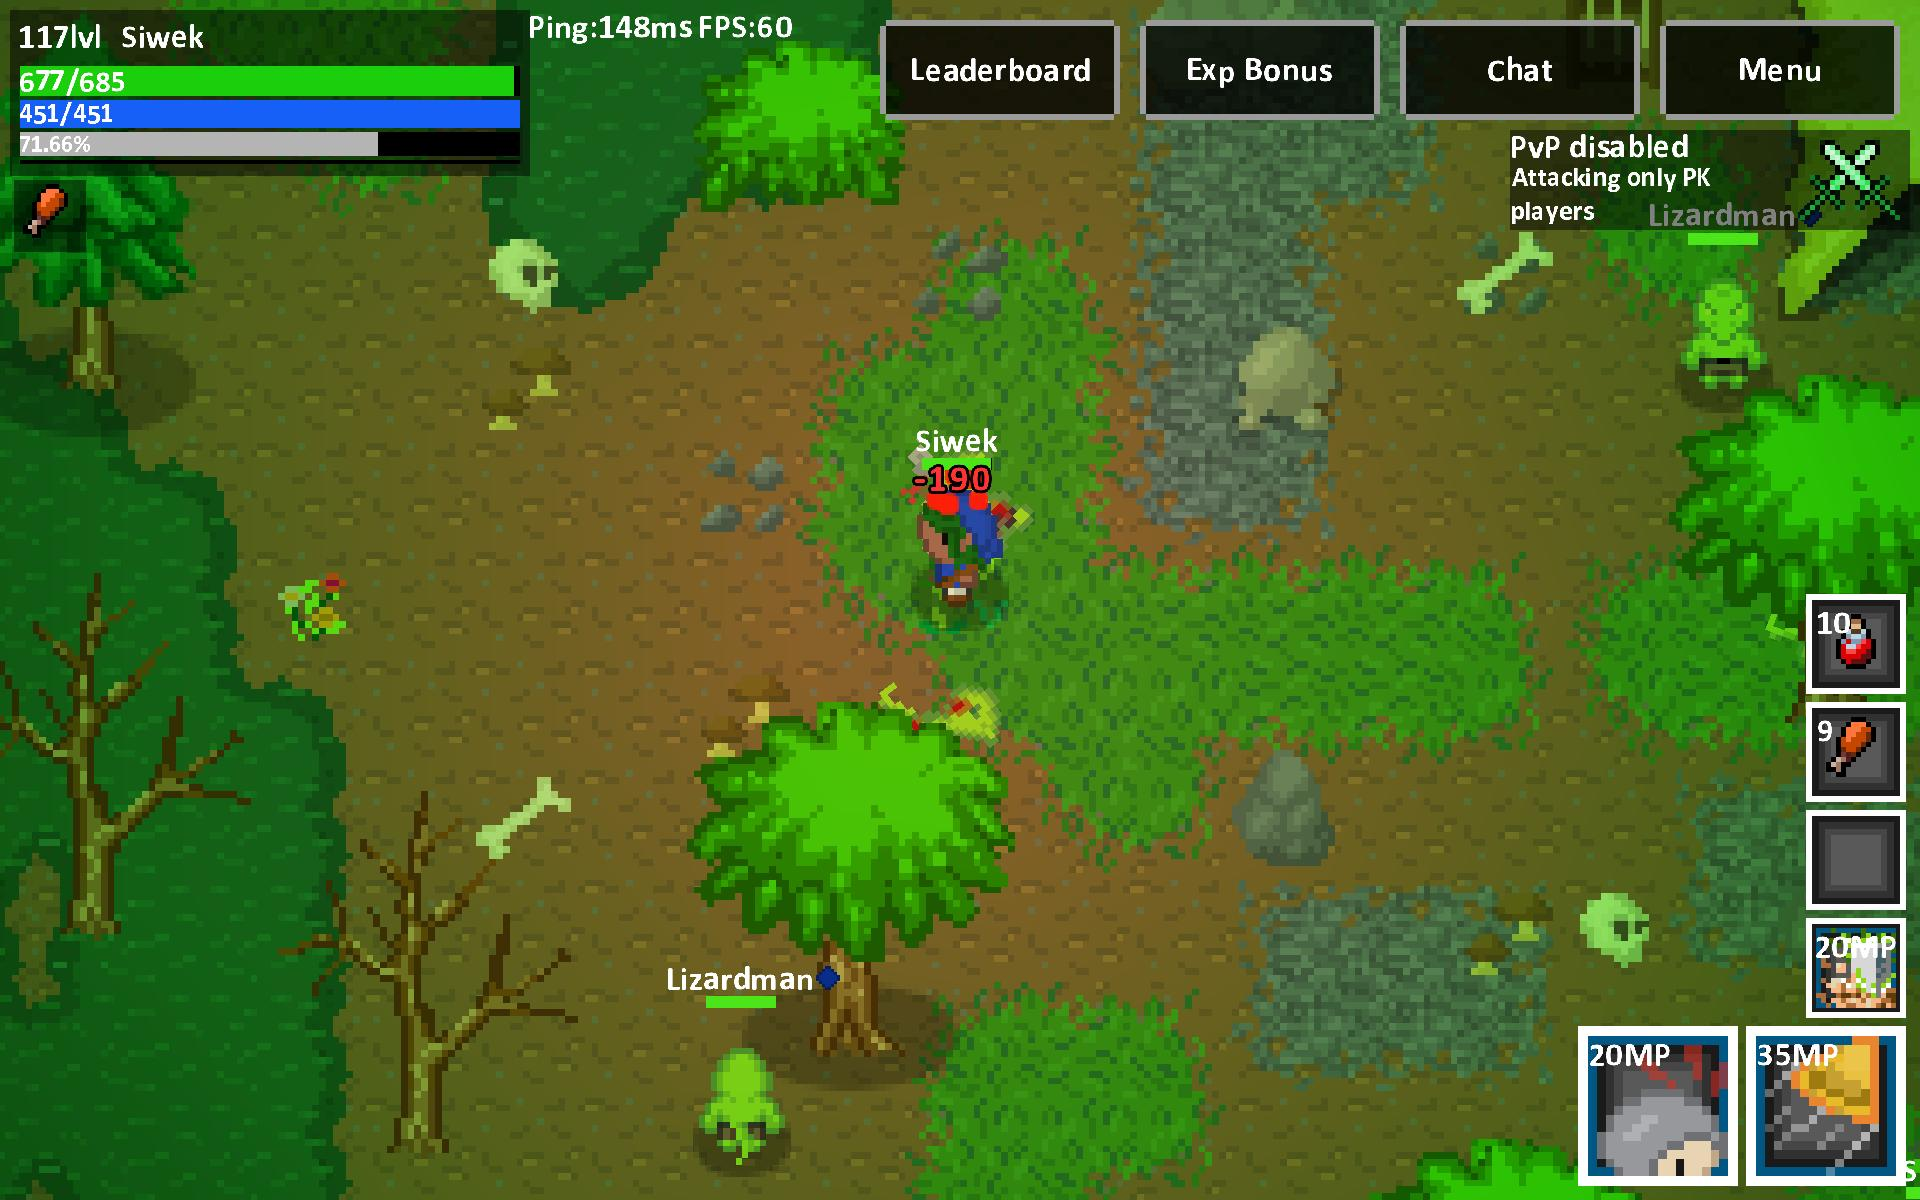 Heroes & Rats MMORPG Online 0.32.2 Screenshot 1